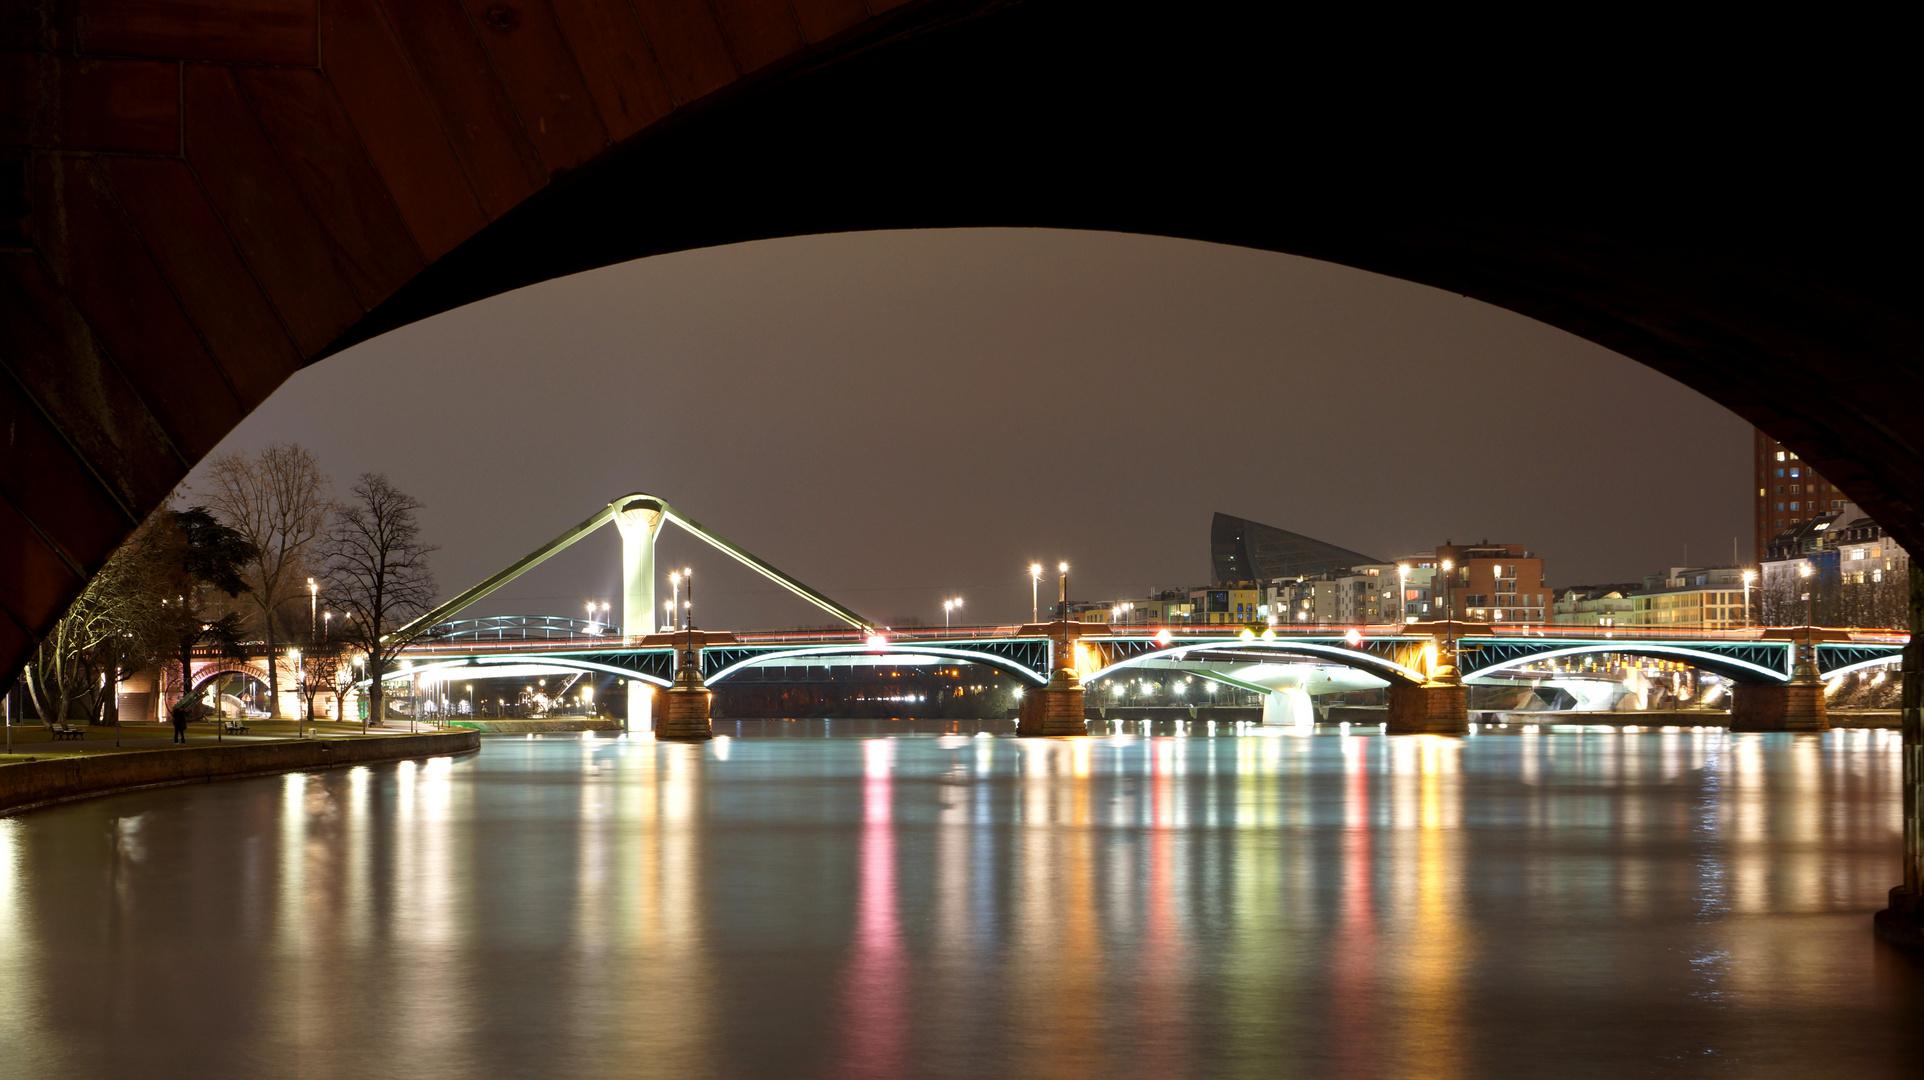 Fotopraxis - Frankfurt a. M. bei Nacht 3